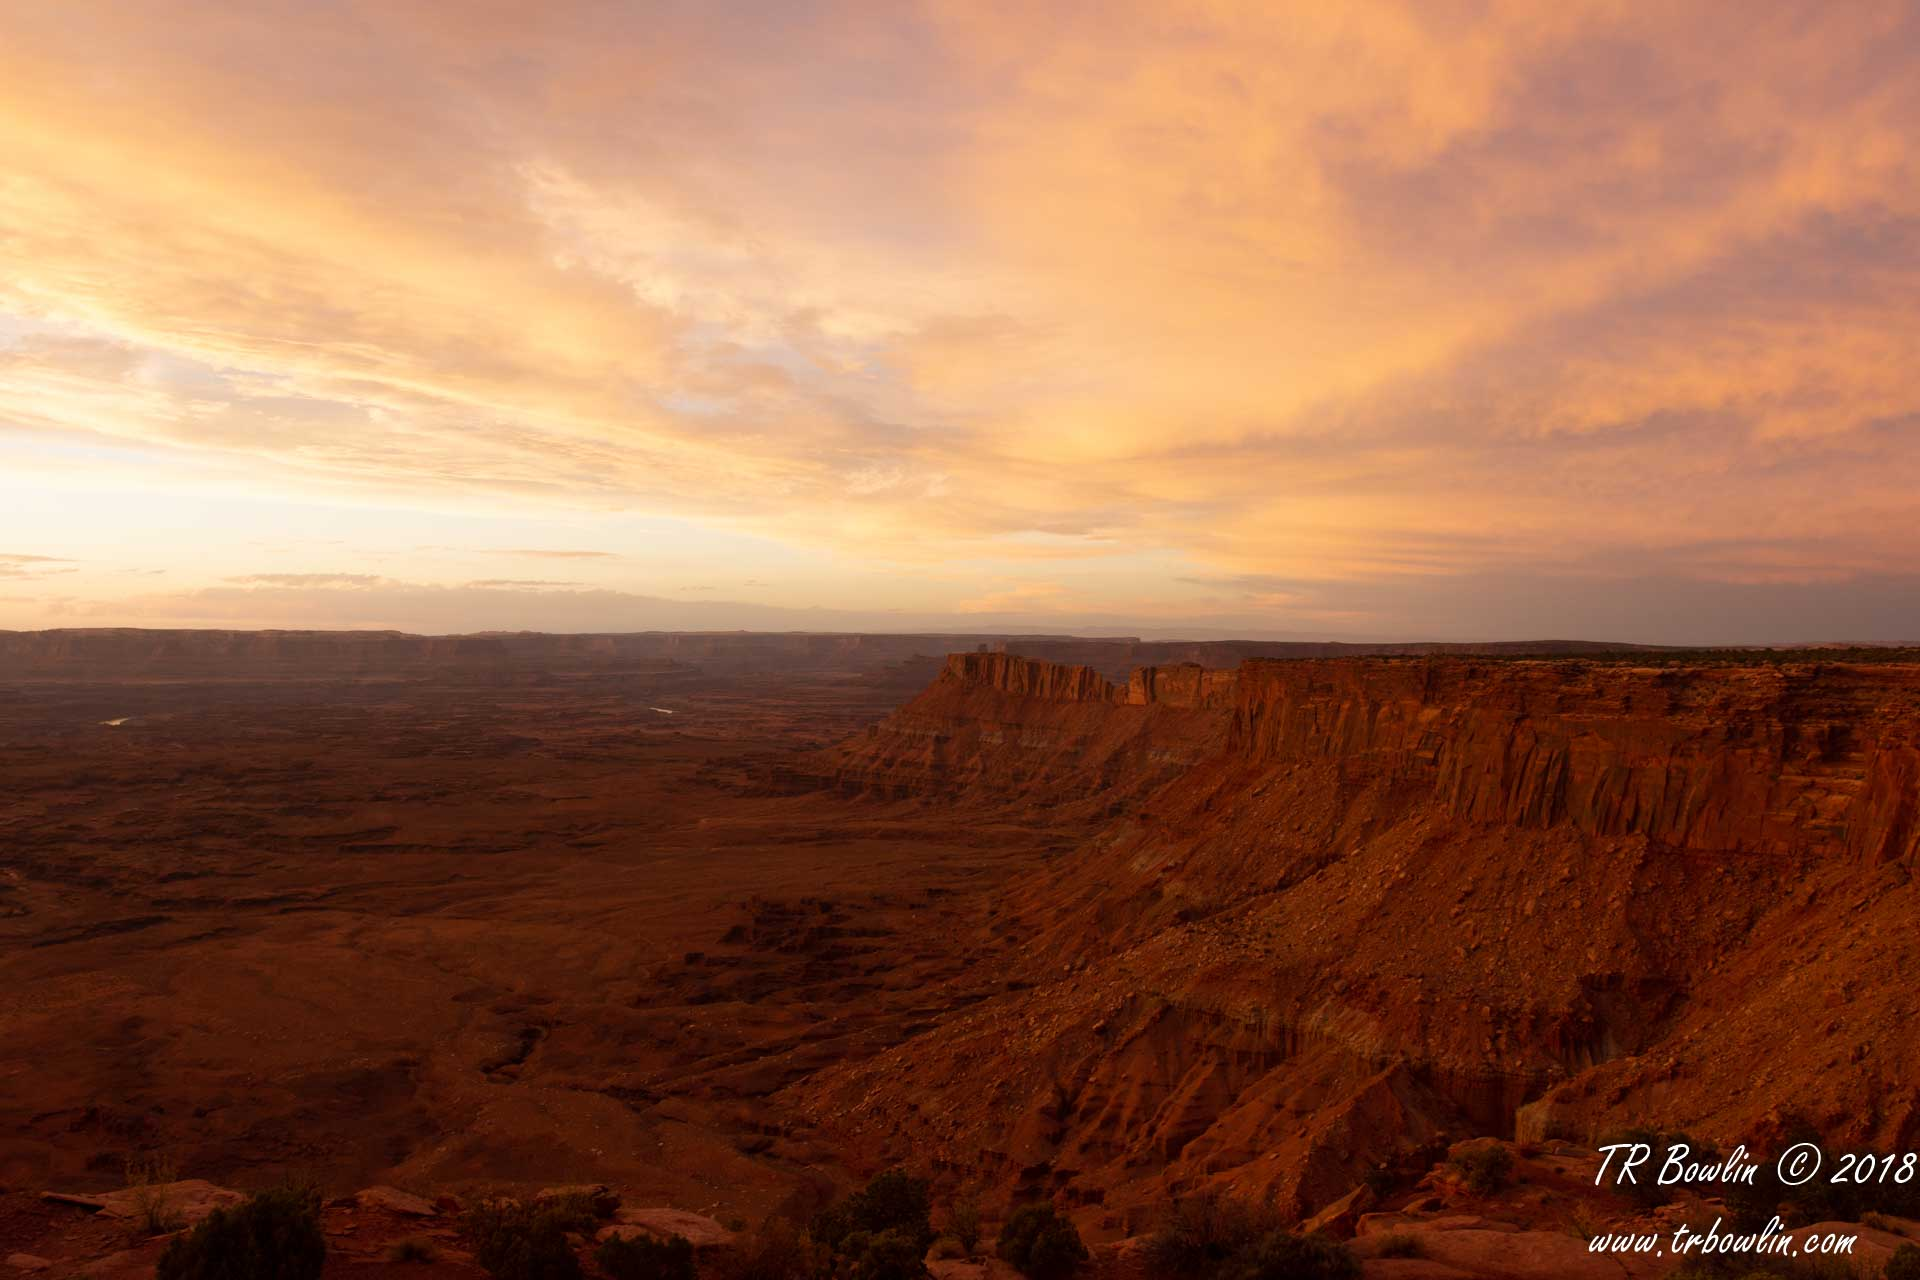 Canyonlands National Park, Needles Overlook, Sunset